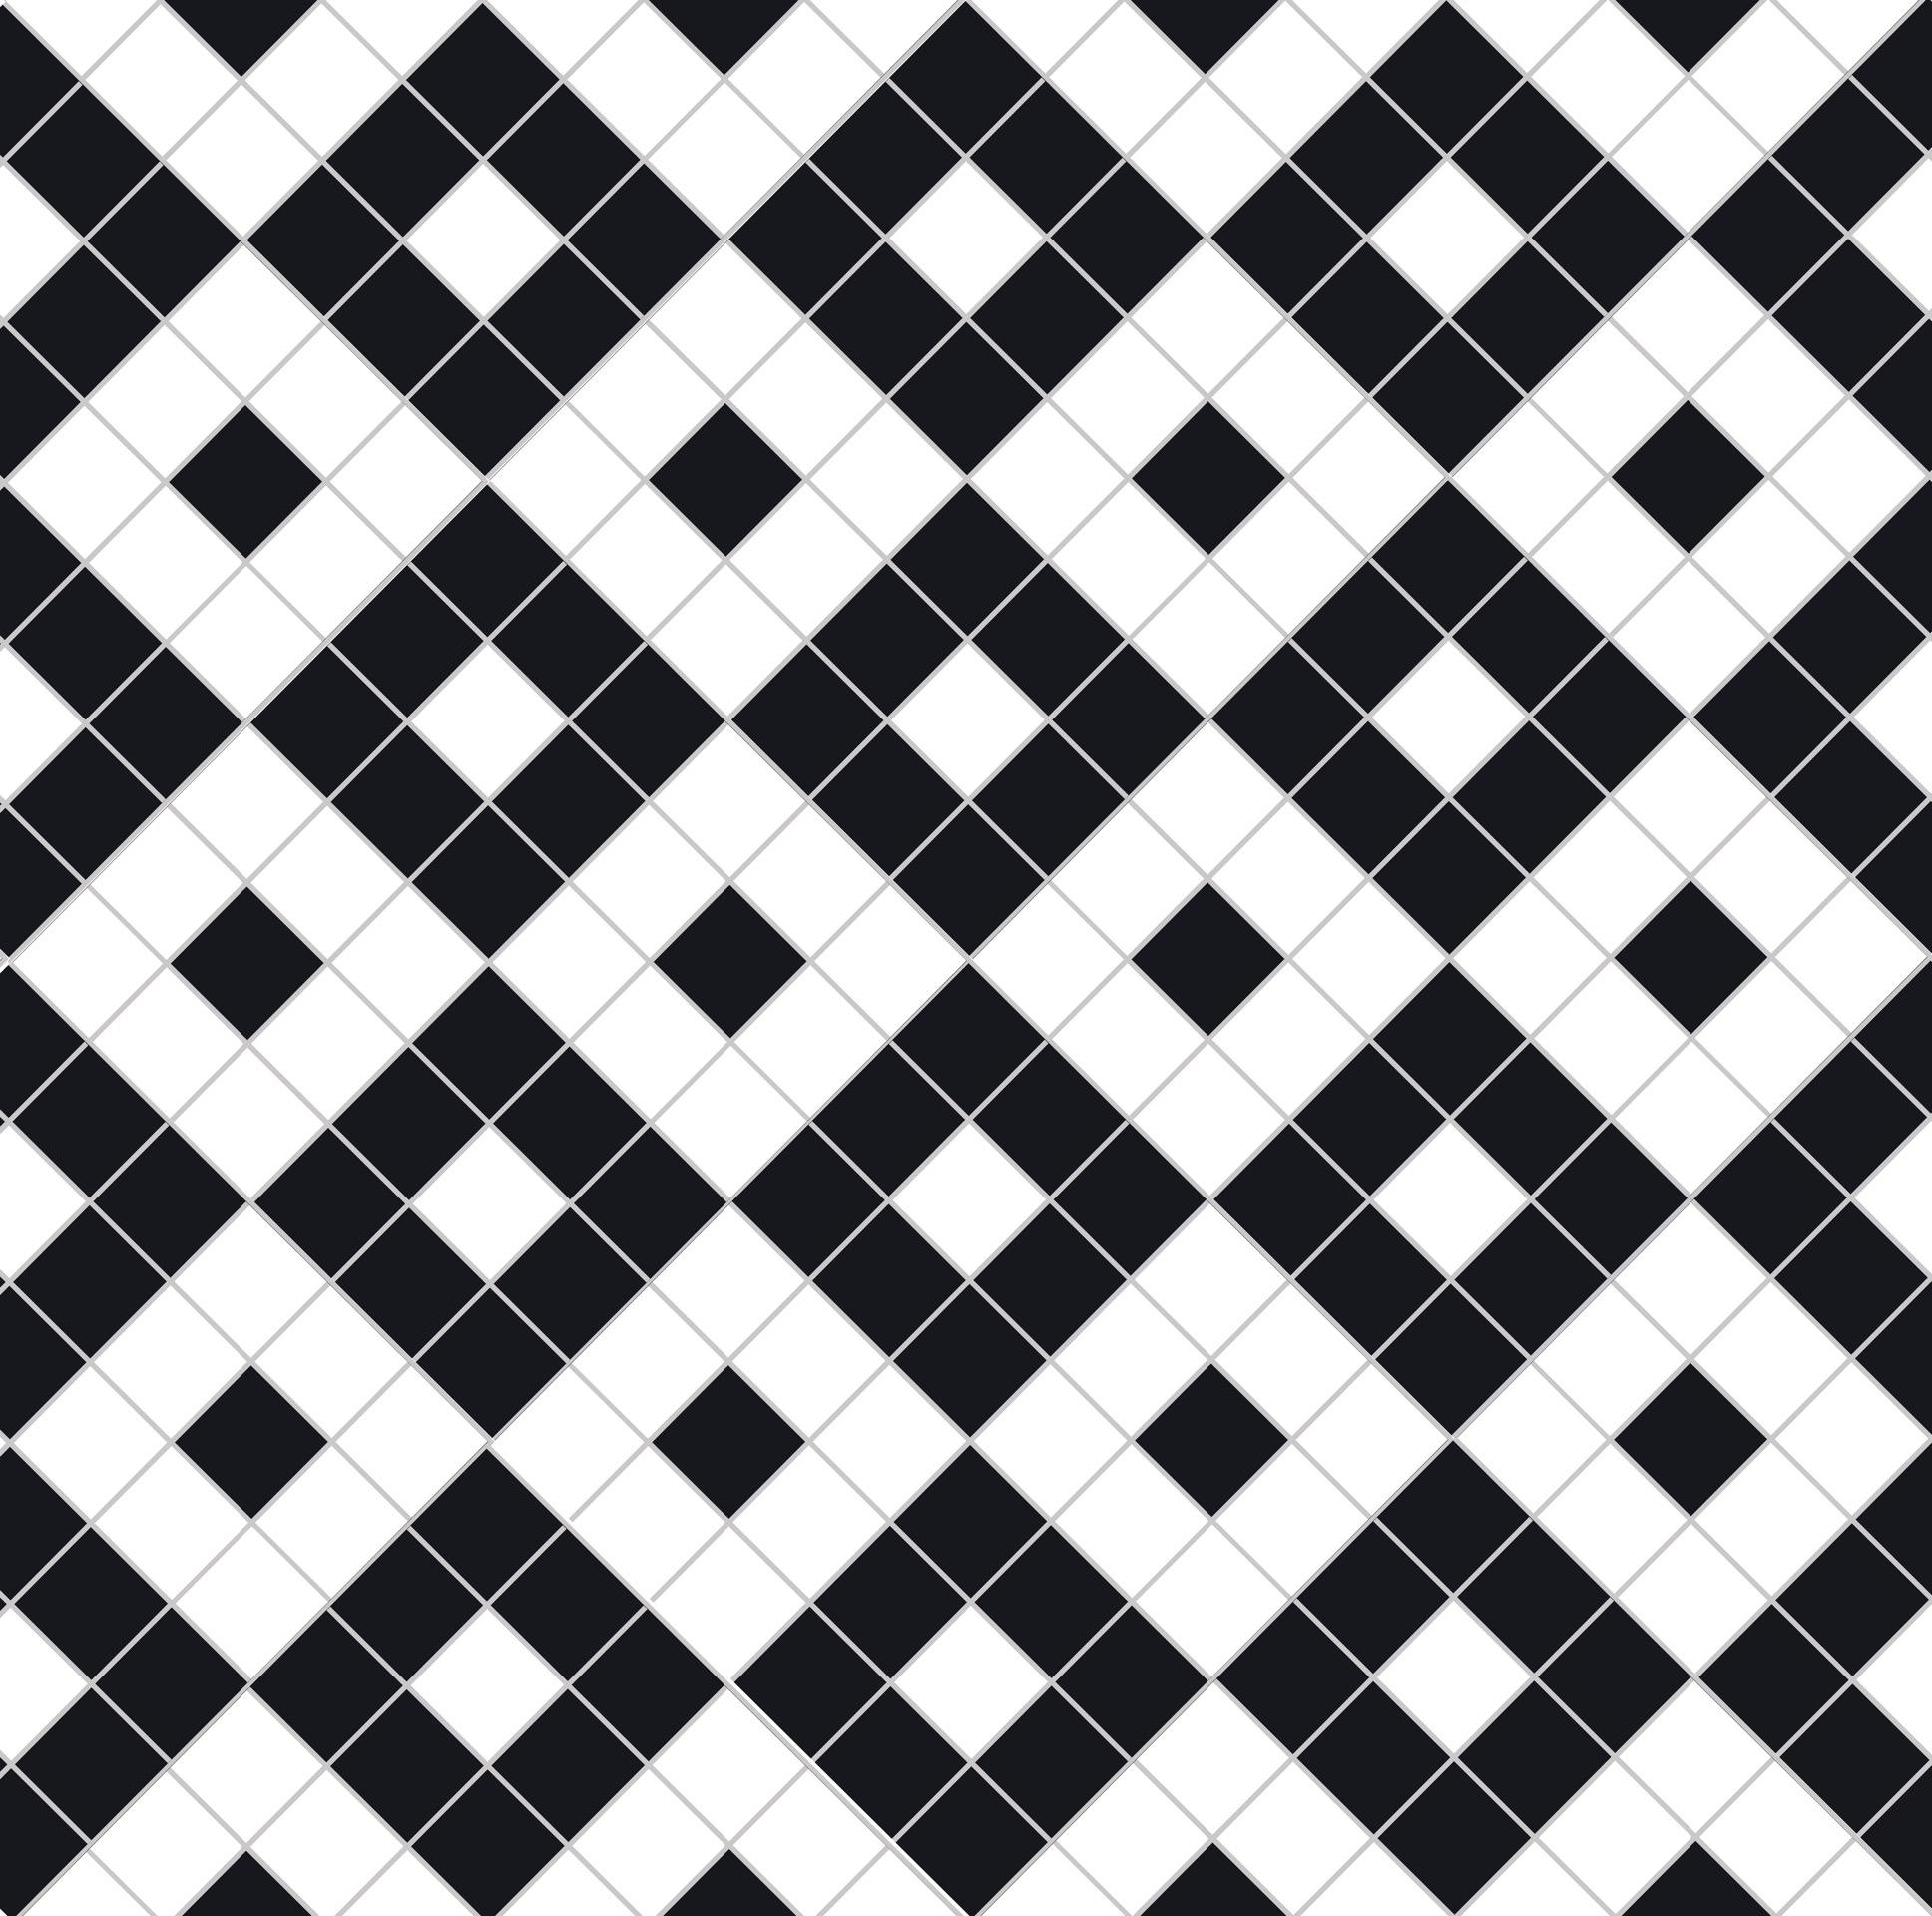 black and white victorian floor tiles